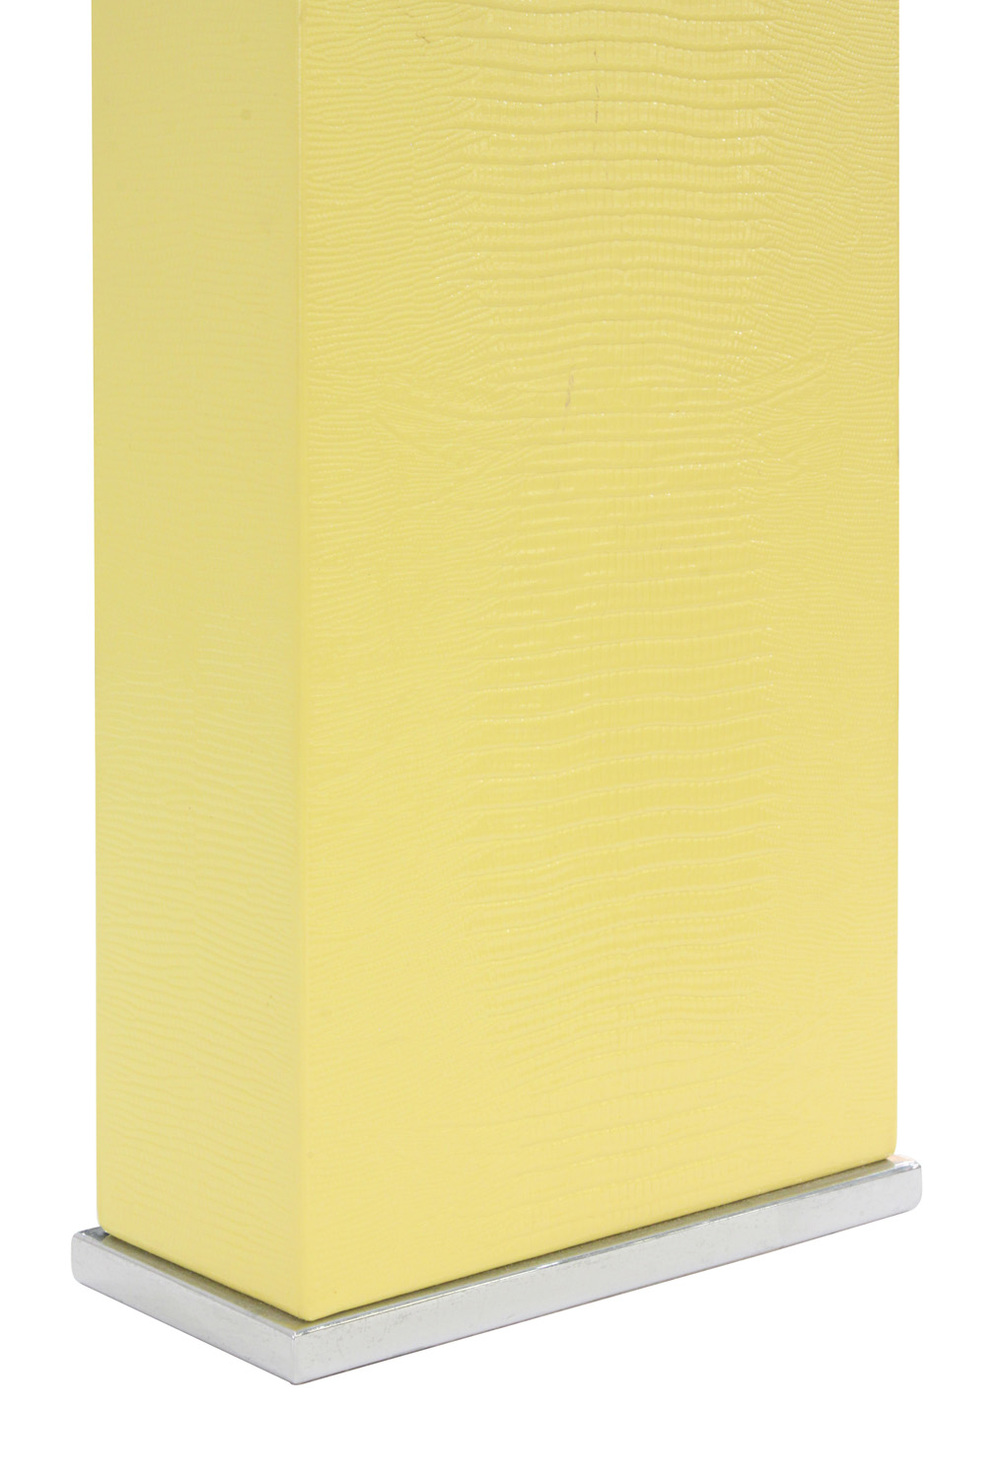 Springer 65 yellow lizard+shade tablelamp227 detail2 hires.jpg